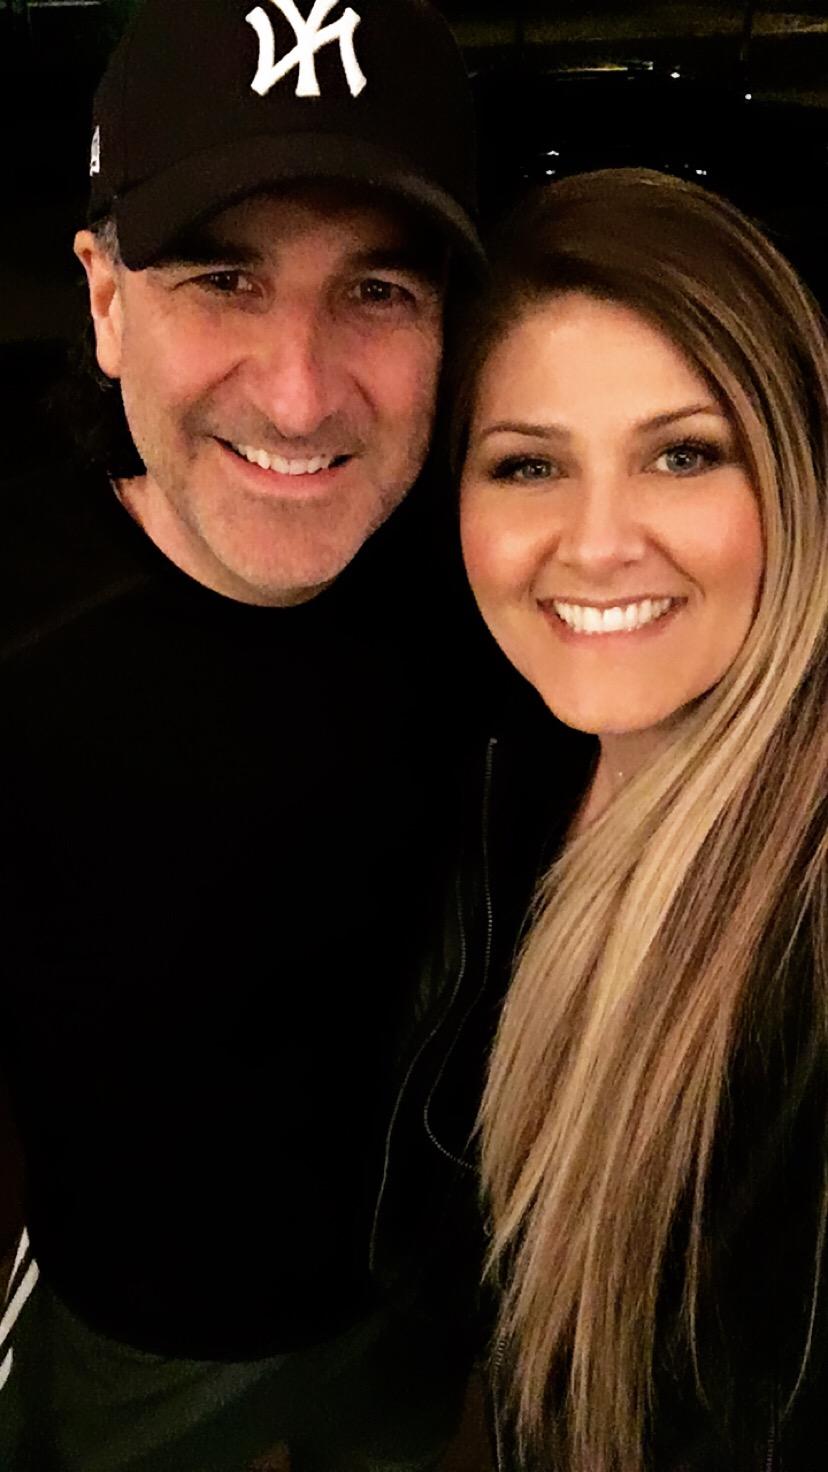 David Huff & Randi - Nashville